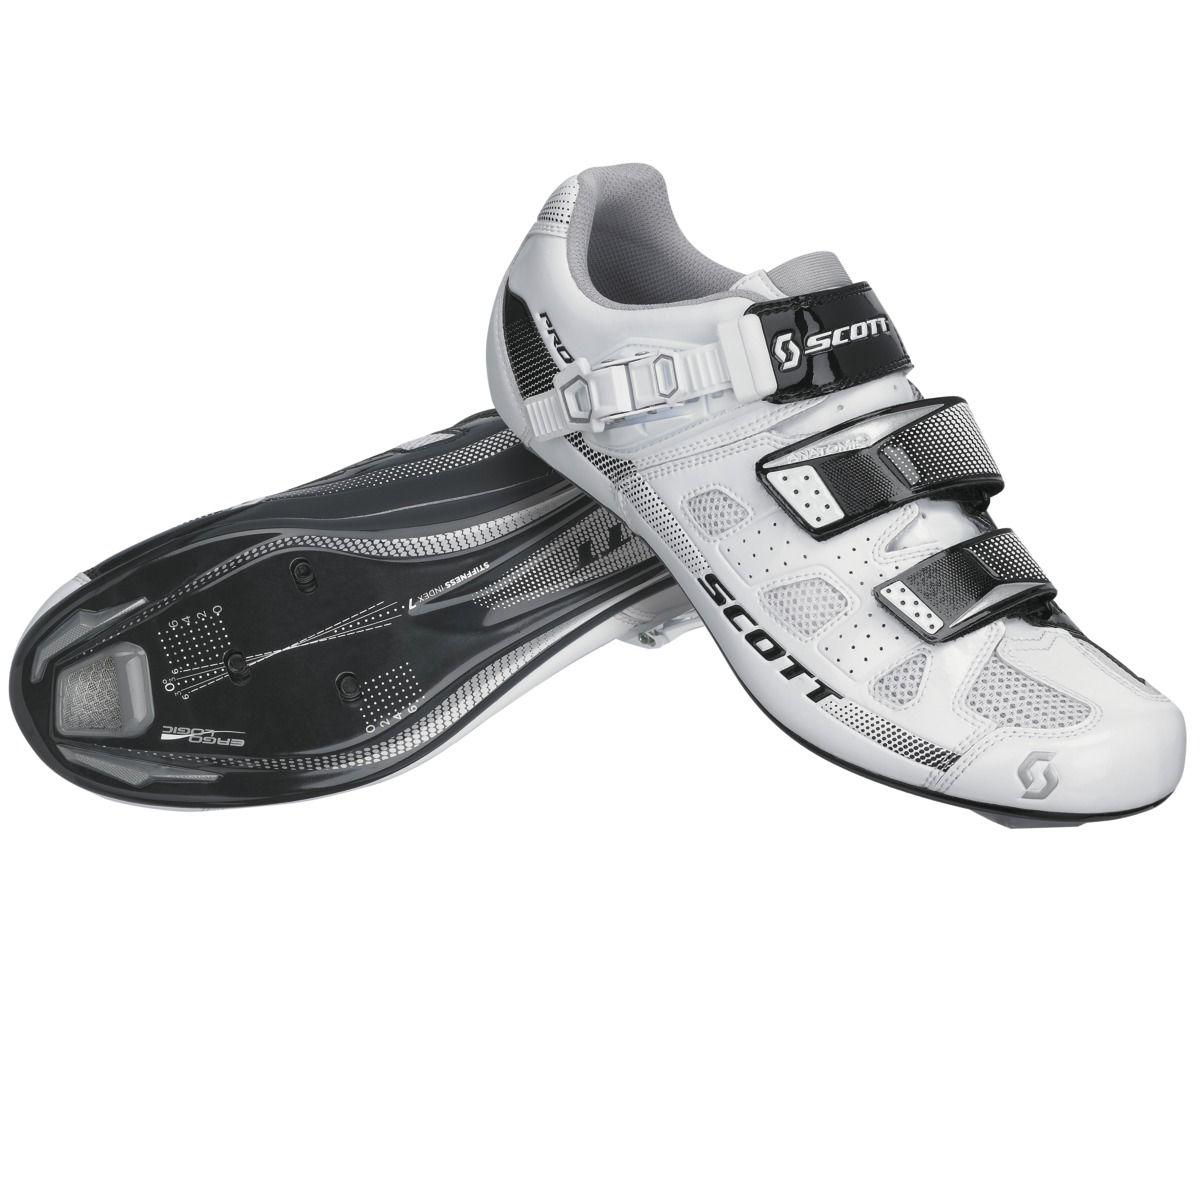 Shoe-road-Pro-white-black-gloss